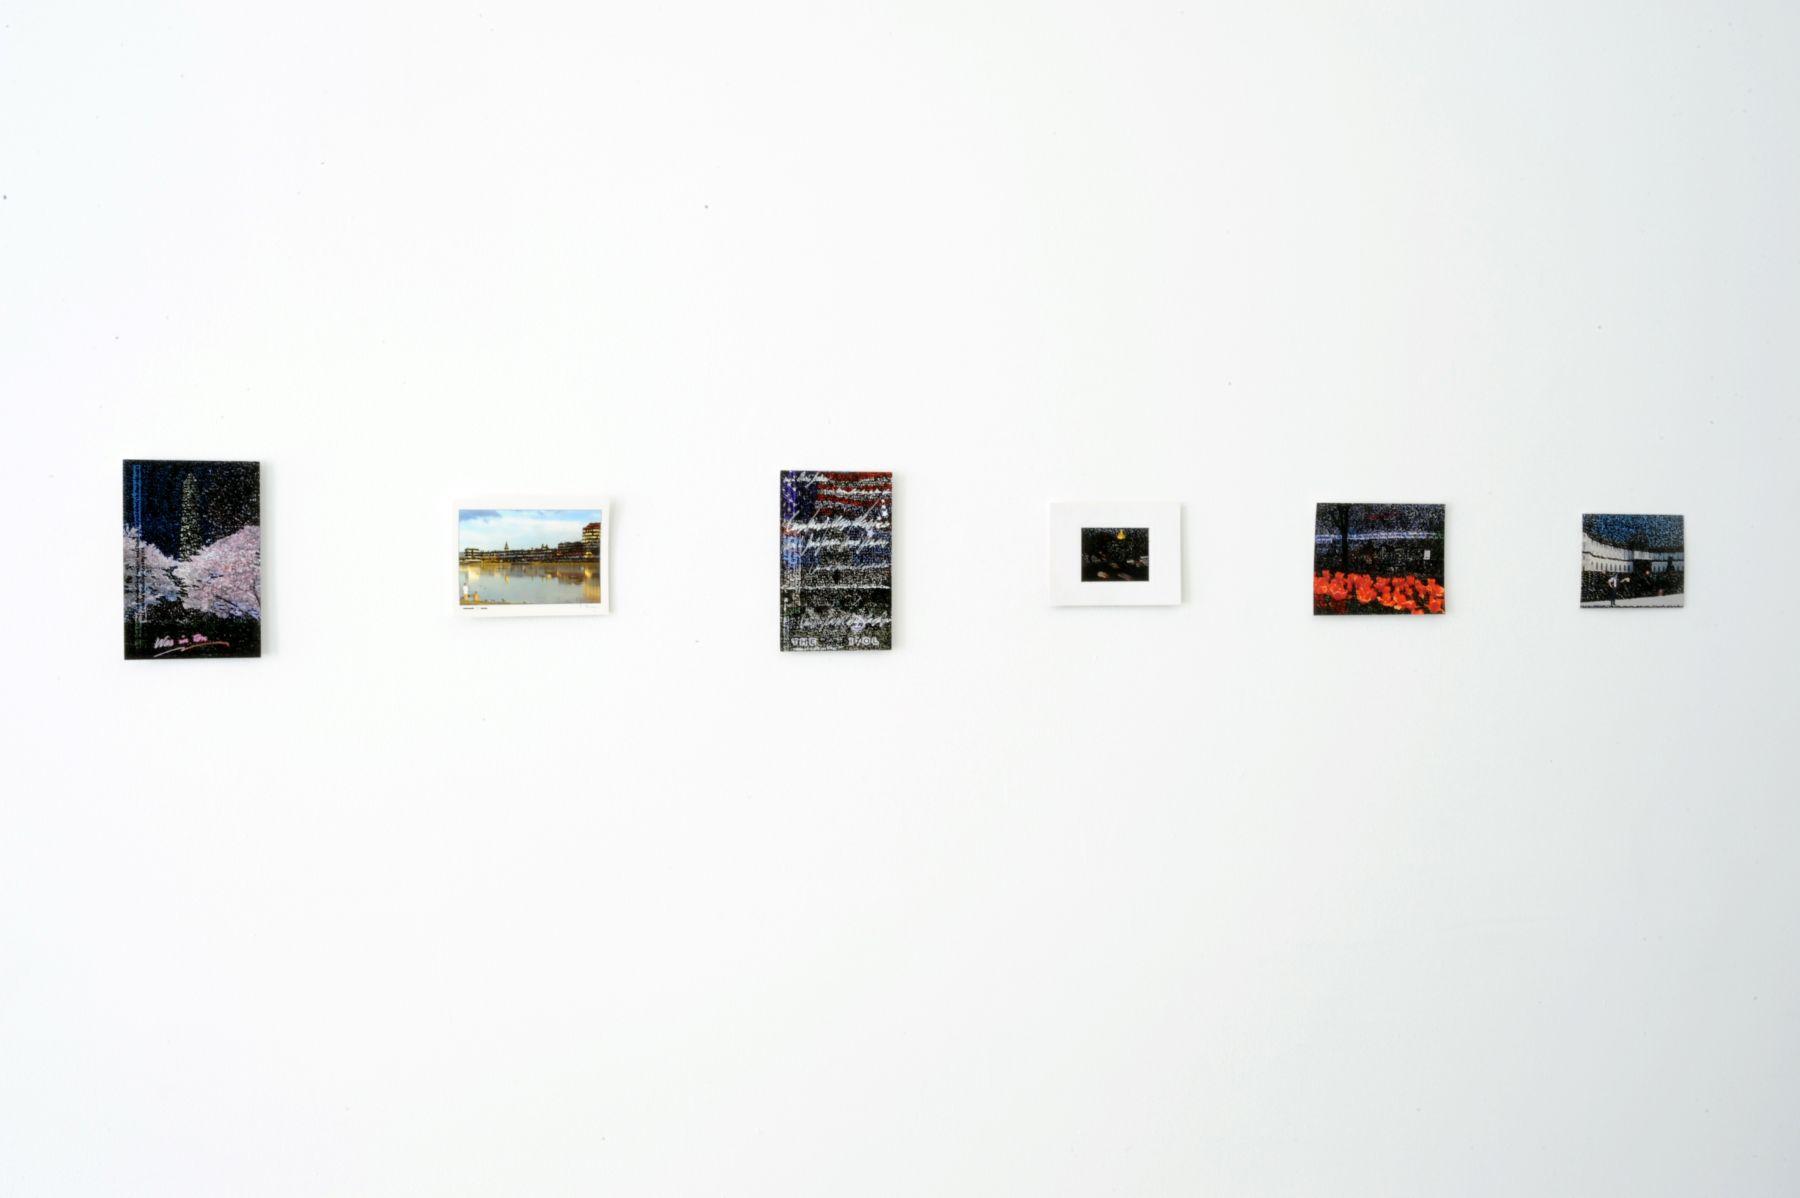 DIE VETTERN: LINA VARGAS DE LA HOZ, IRIS CHRISTINE AUE, EVI LEUCHTGELB and CHRISTA AISTLEITNER  Wir packen in unseren Koffer / Packing Our Suitcase 2012. Installation view: Conner Contemporary Art.